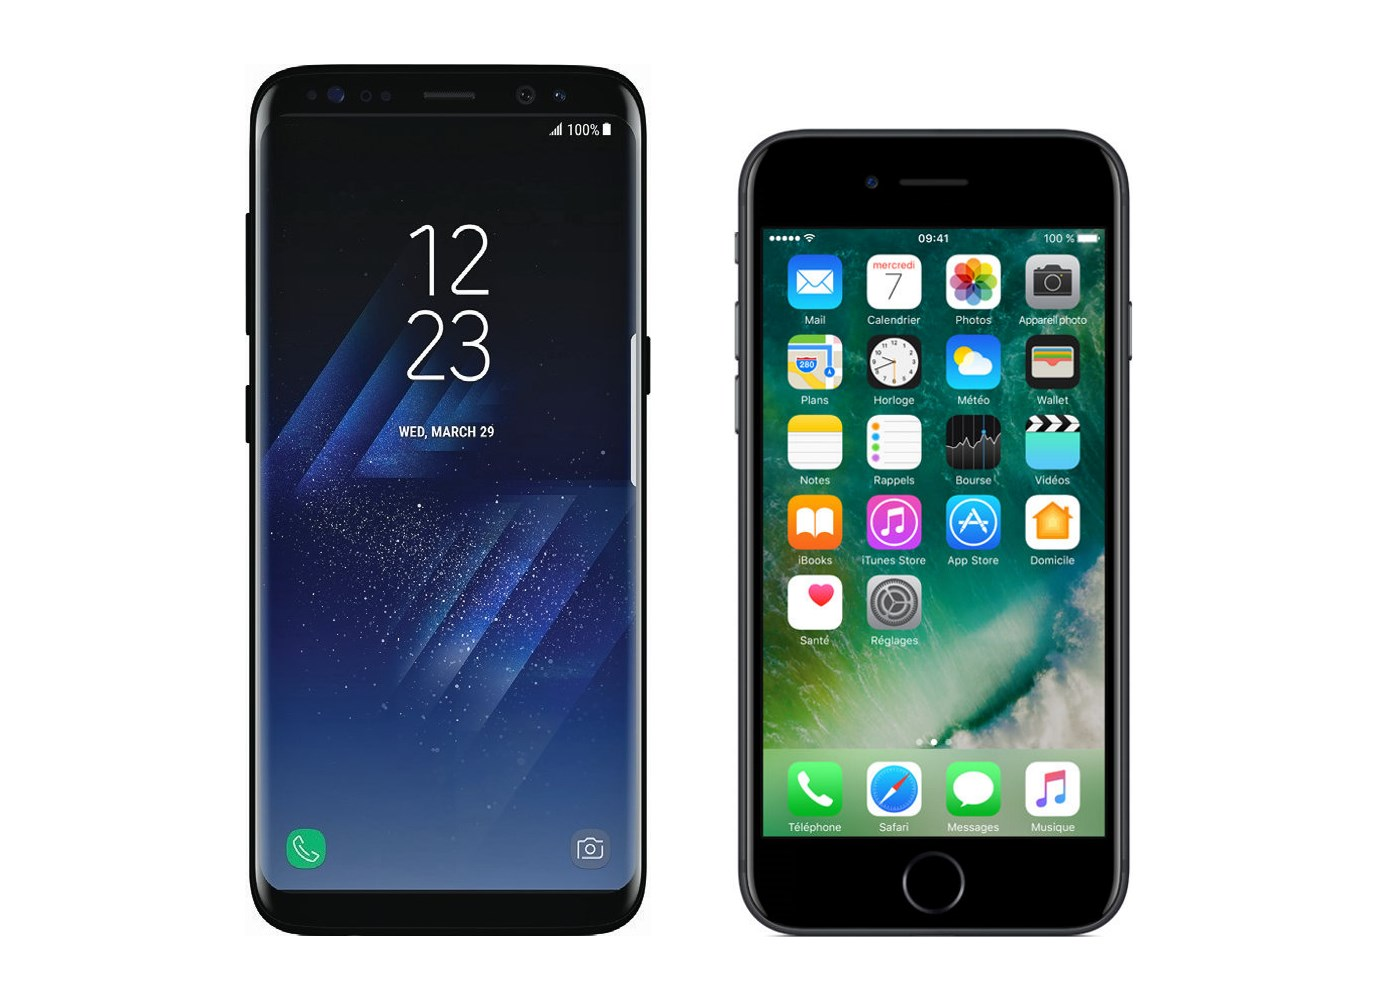 samsung galaxy s8 vs apple iphone 7 le cor en ringardise la marque la pomme frandroid. Black Bedroom Furniture Sets. Home Design Ideas